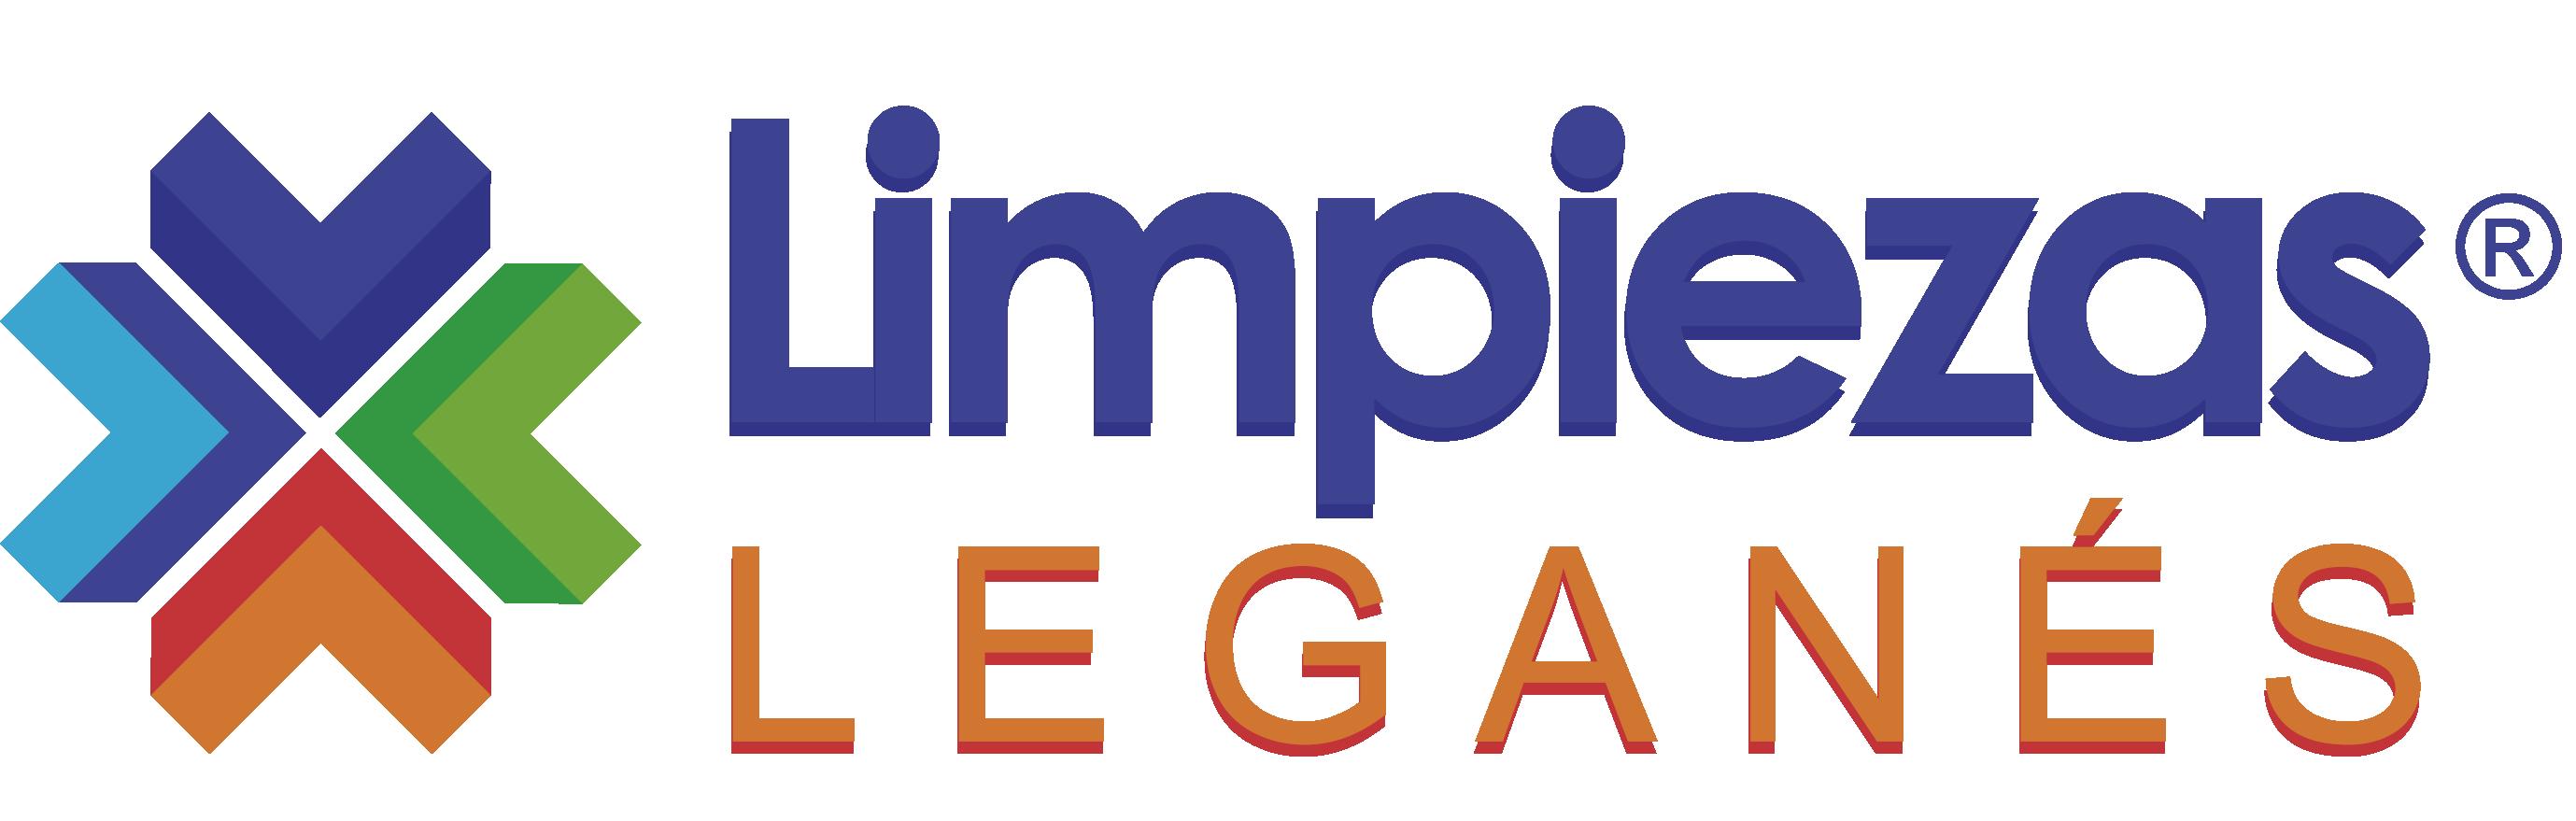 Empresas de limpieza en Leganés